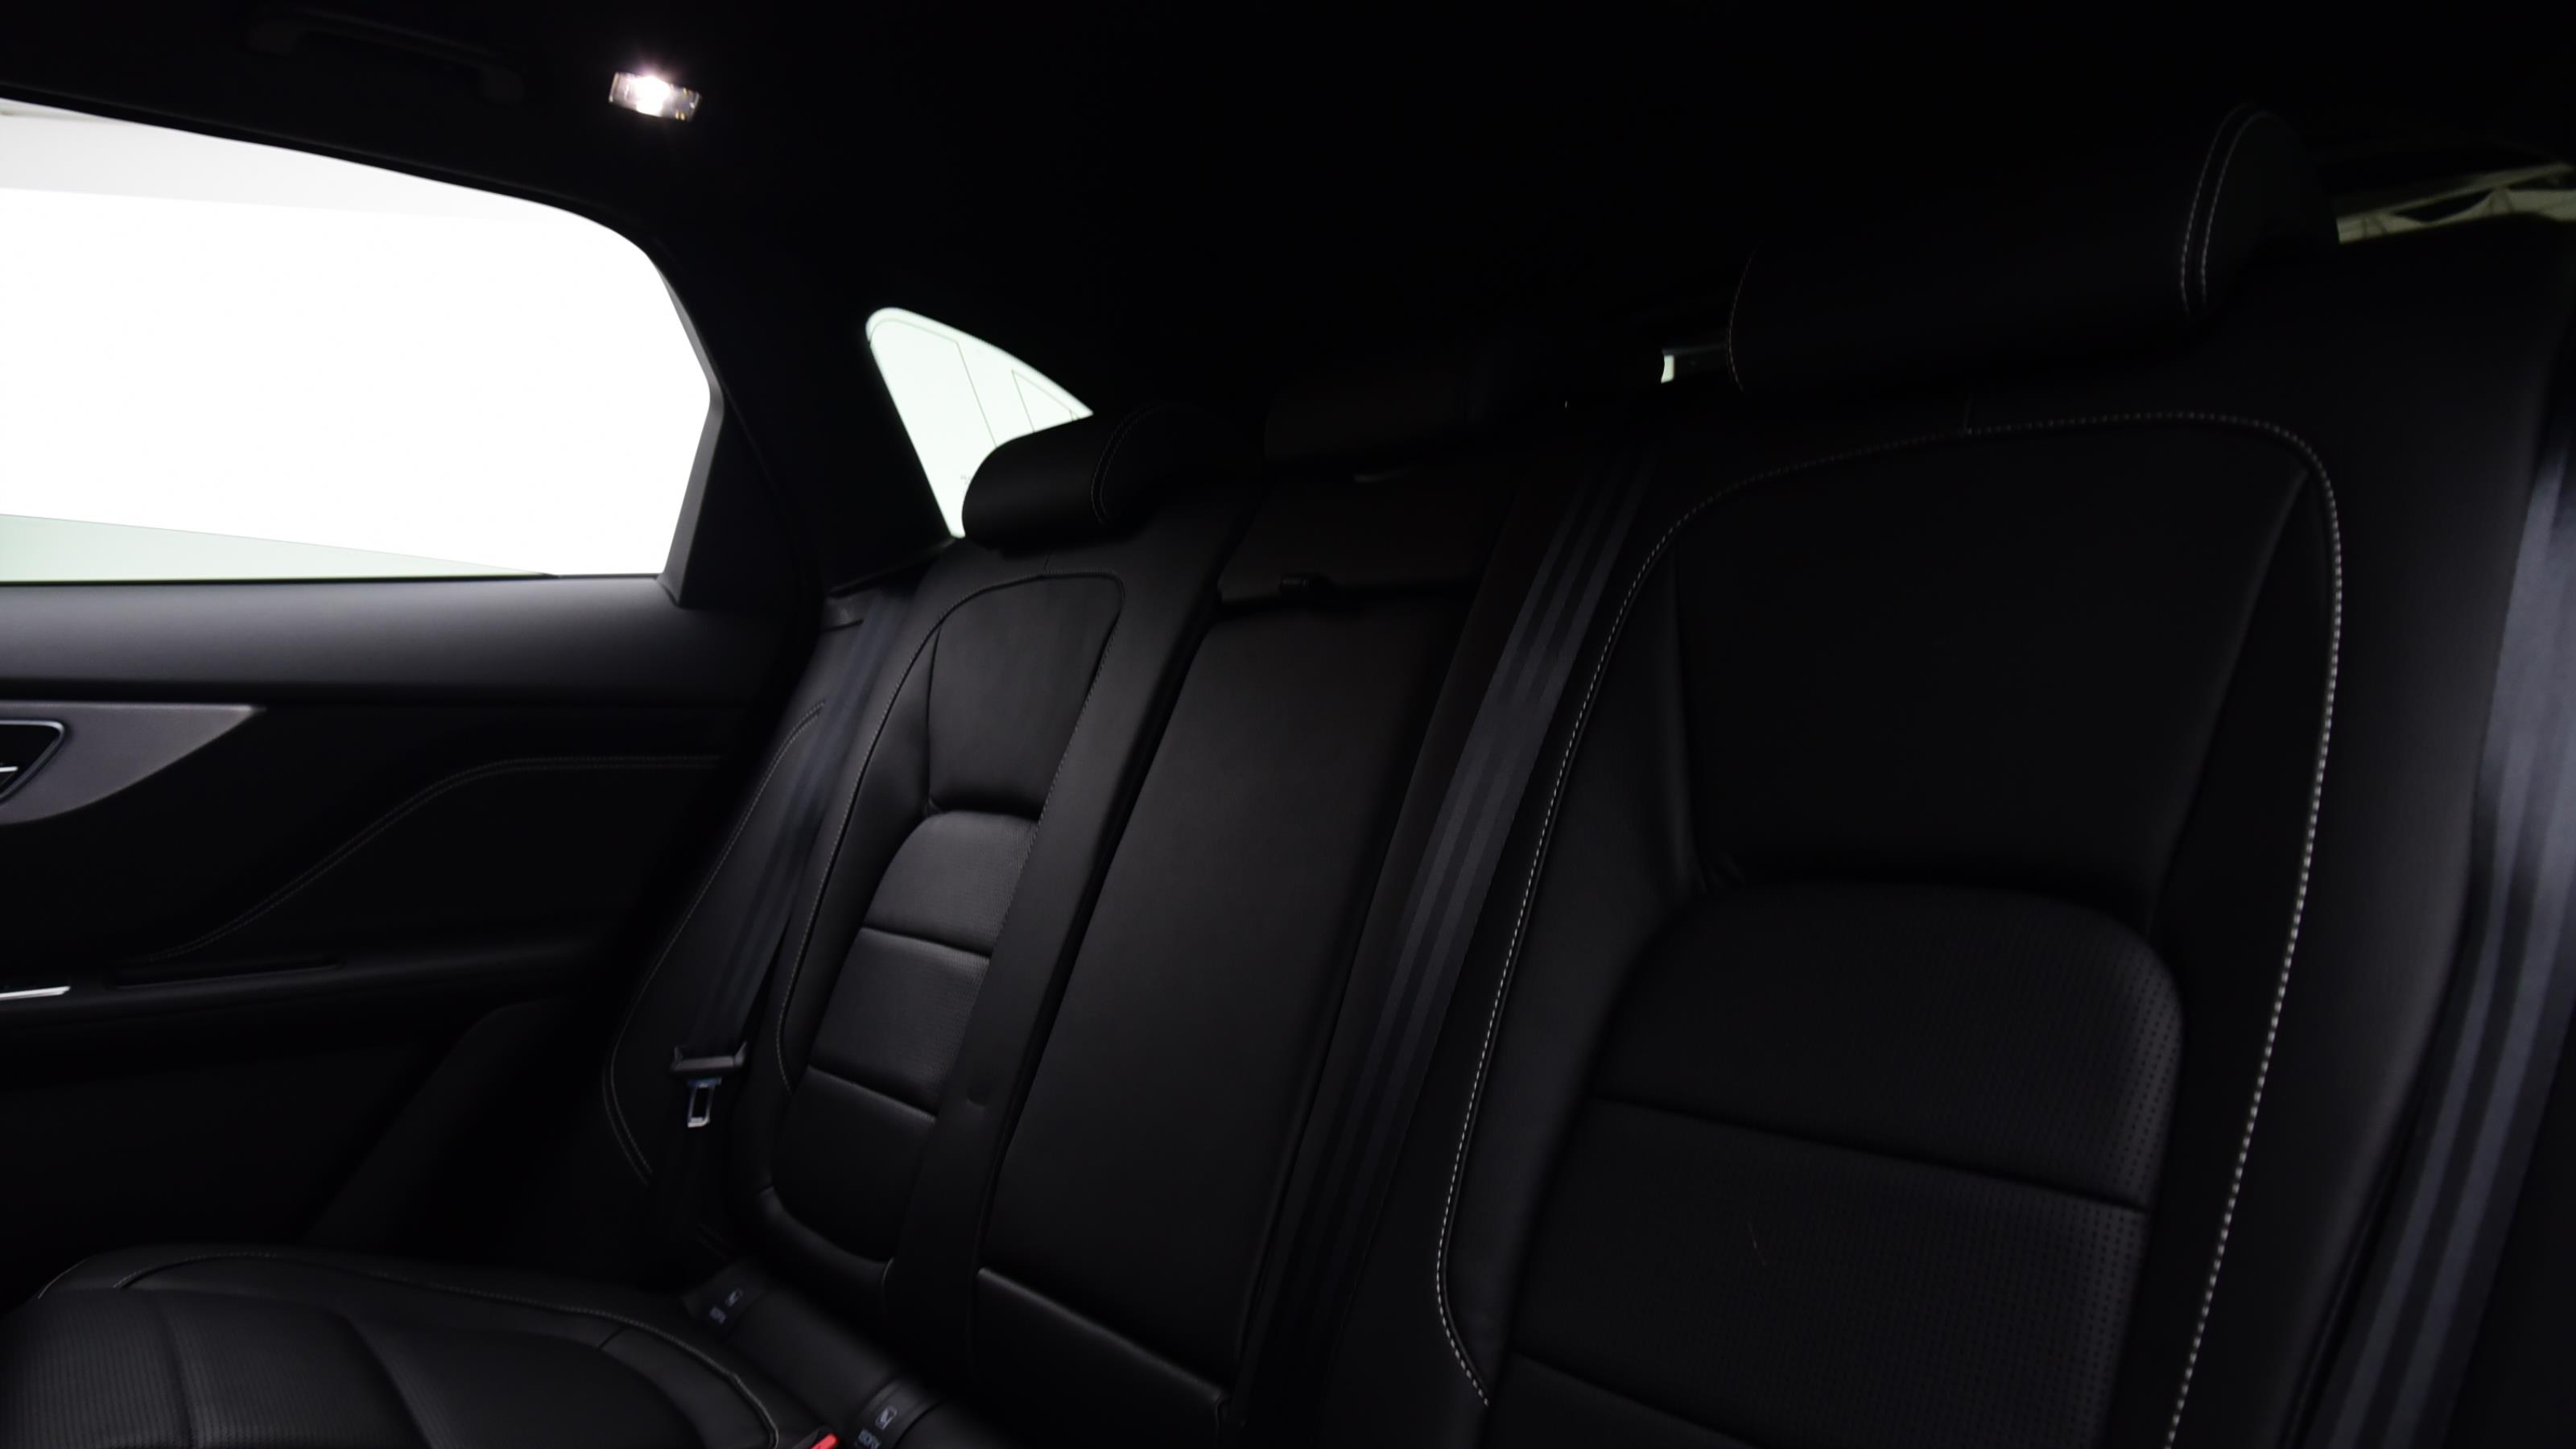 Used 2019 Jaguar F-PACE 2.0d R-Sport 5dr Auto AWD WHITE at Saxton4x4